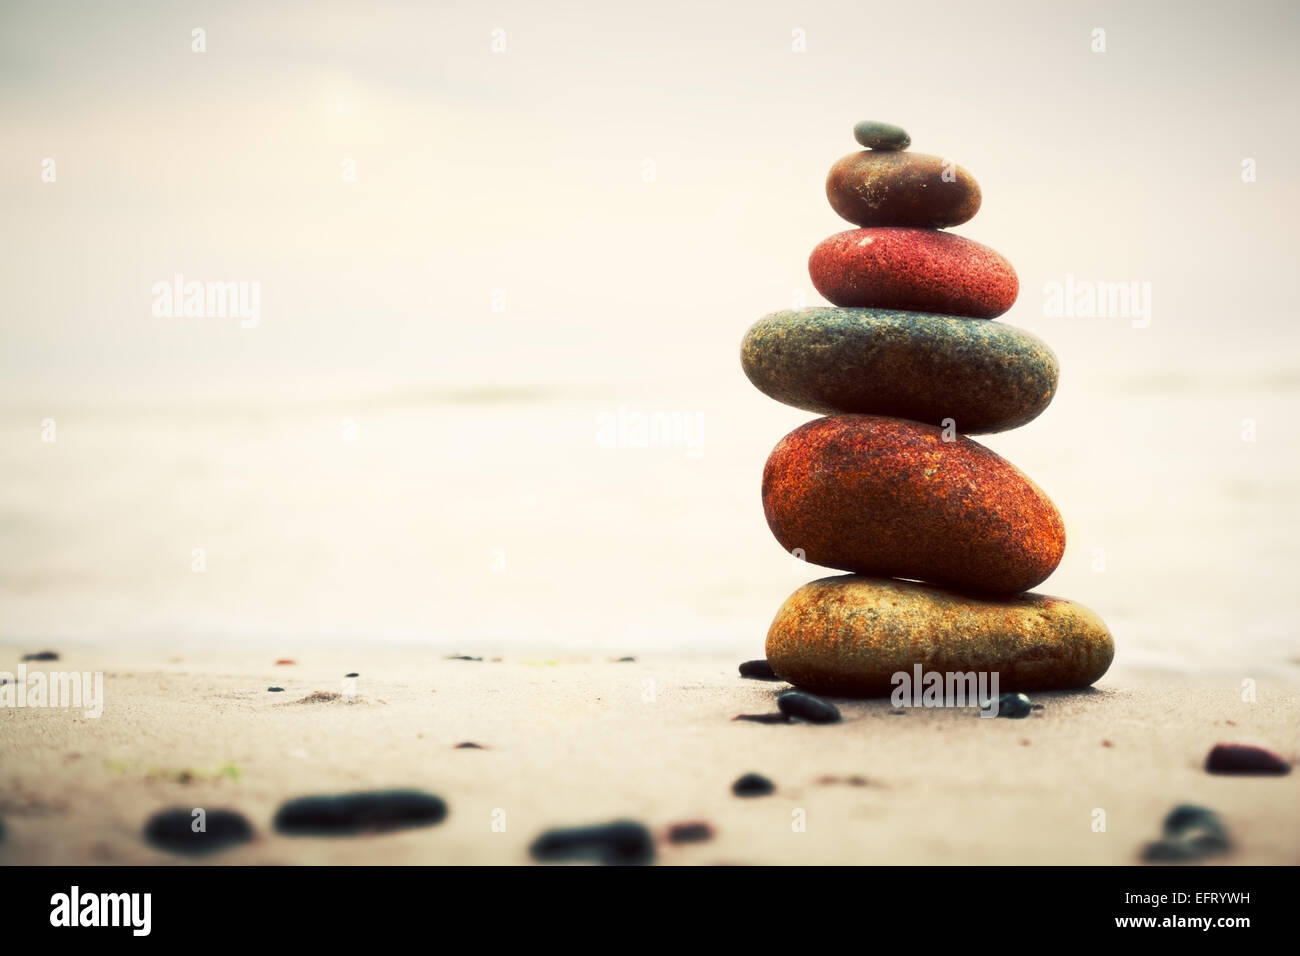 Stones pyramid on sand symbolizing zen, harmony, balance. Ocean in the background Stock Photo